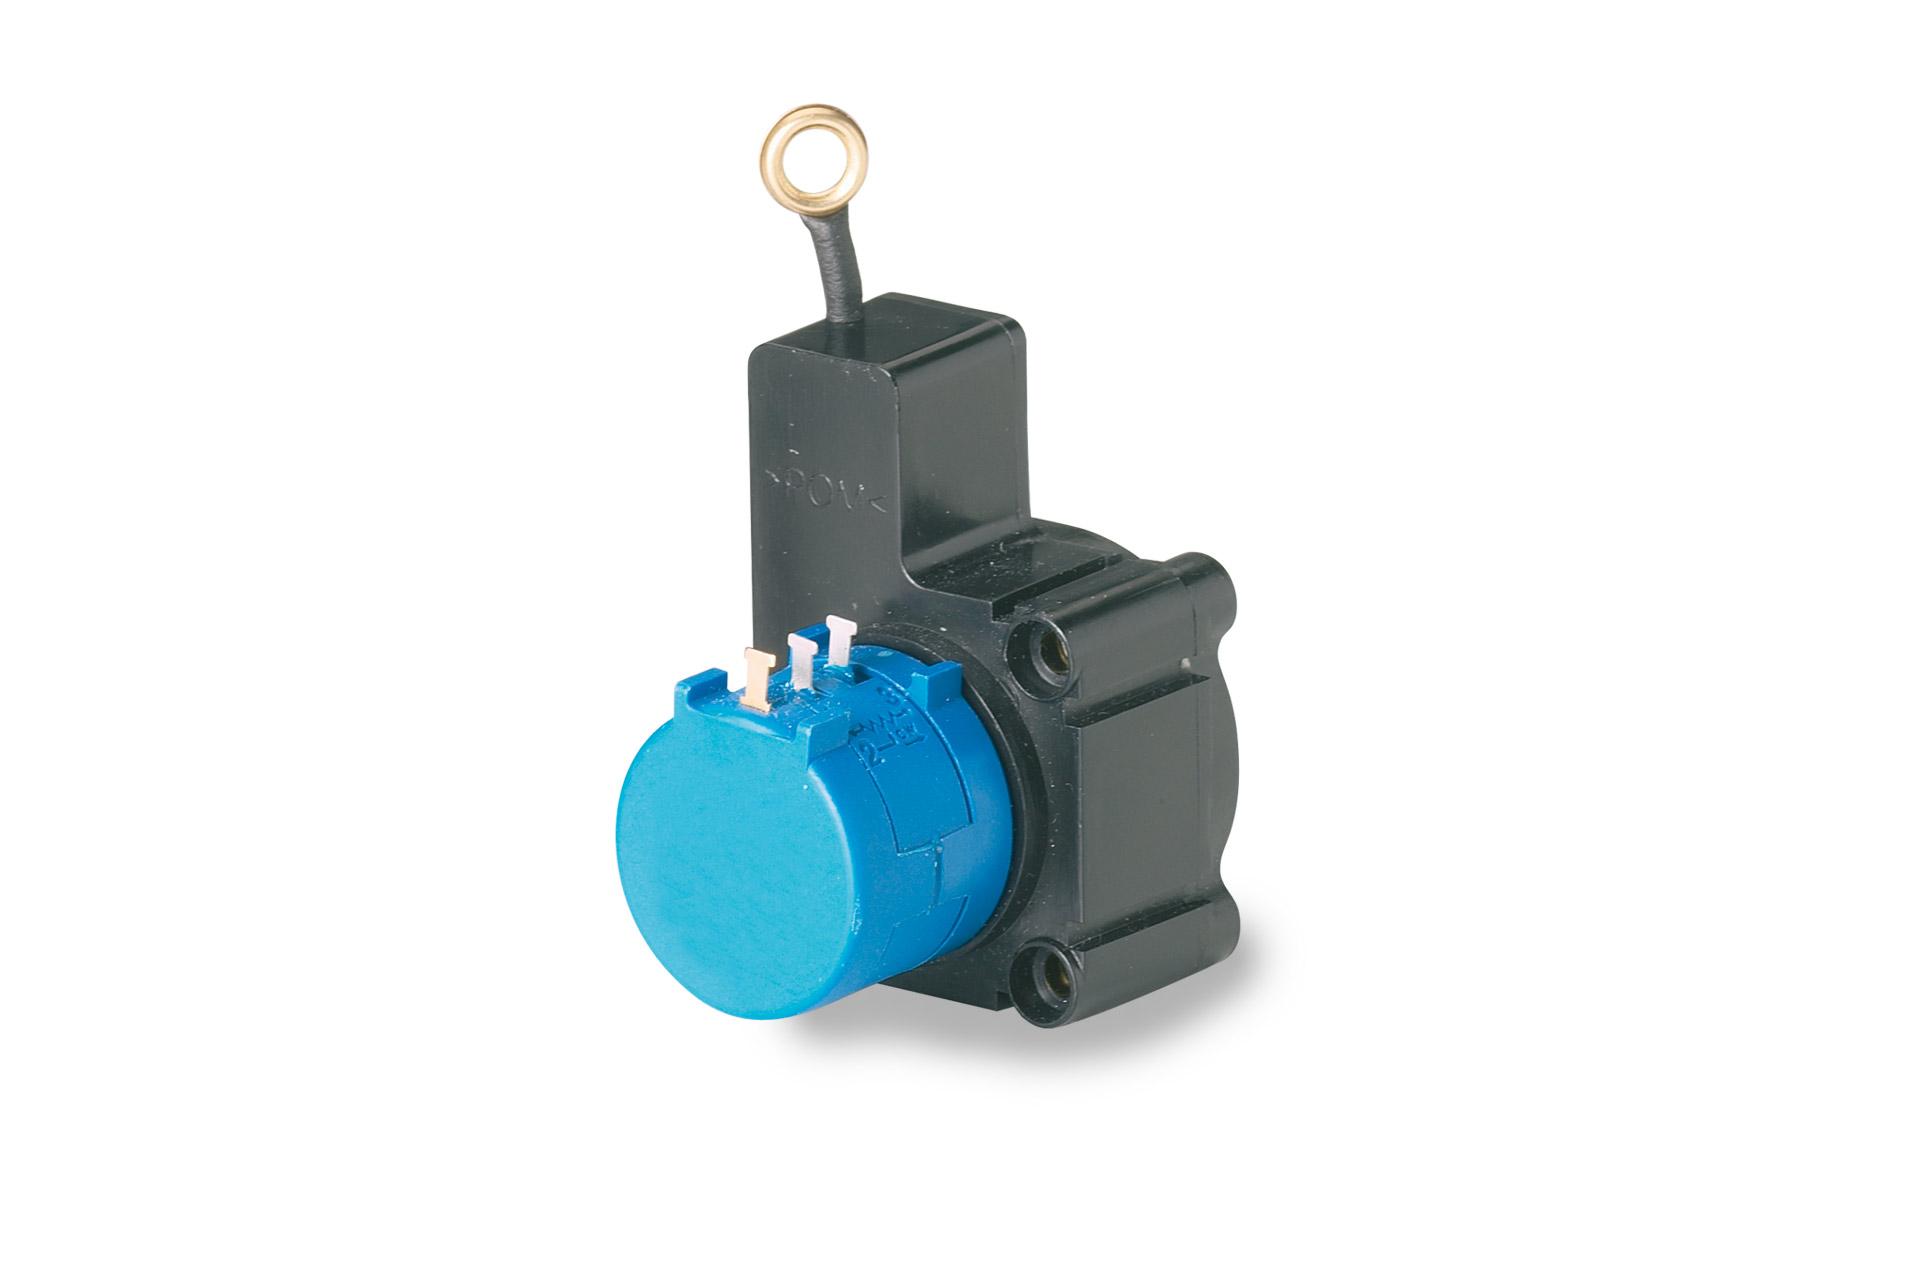 WPS-750-MK30-P10 Miniatur-Seilzug-Wegsensor